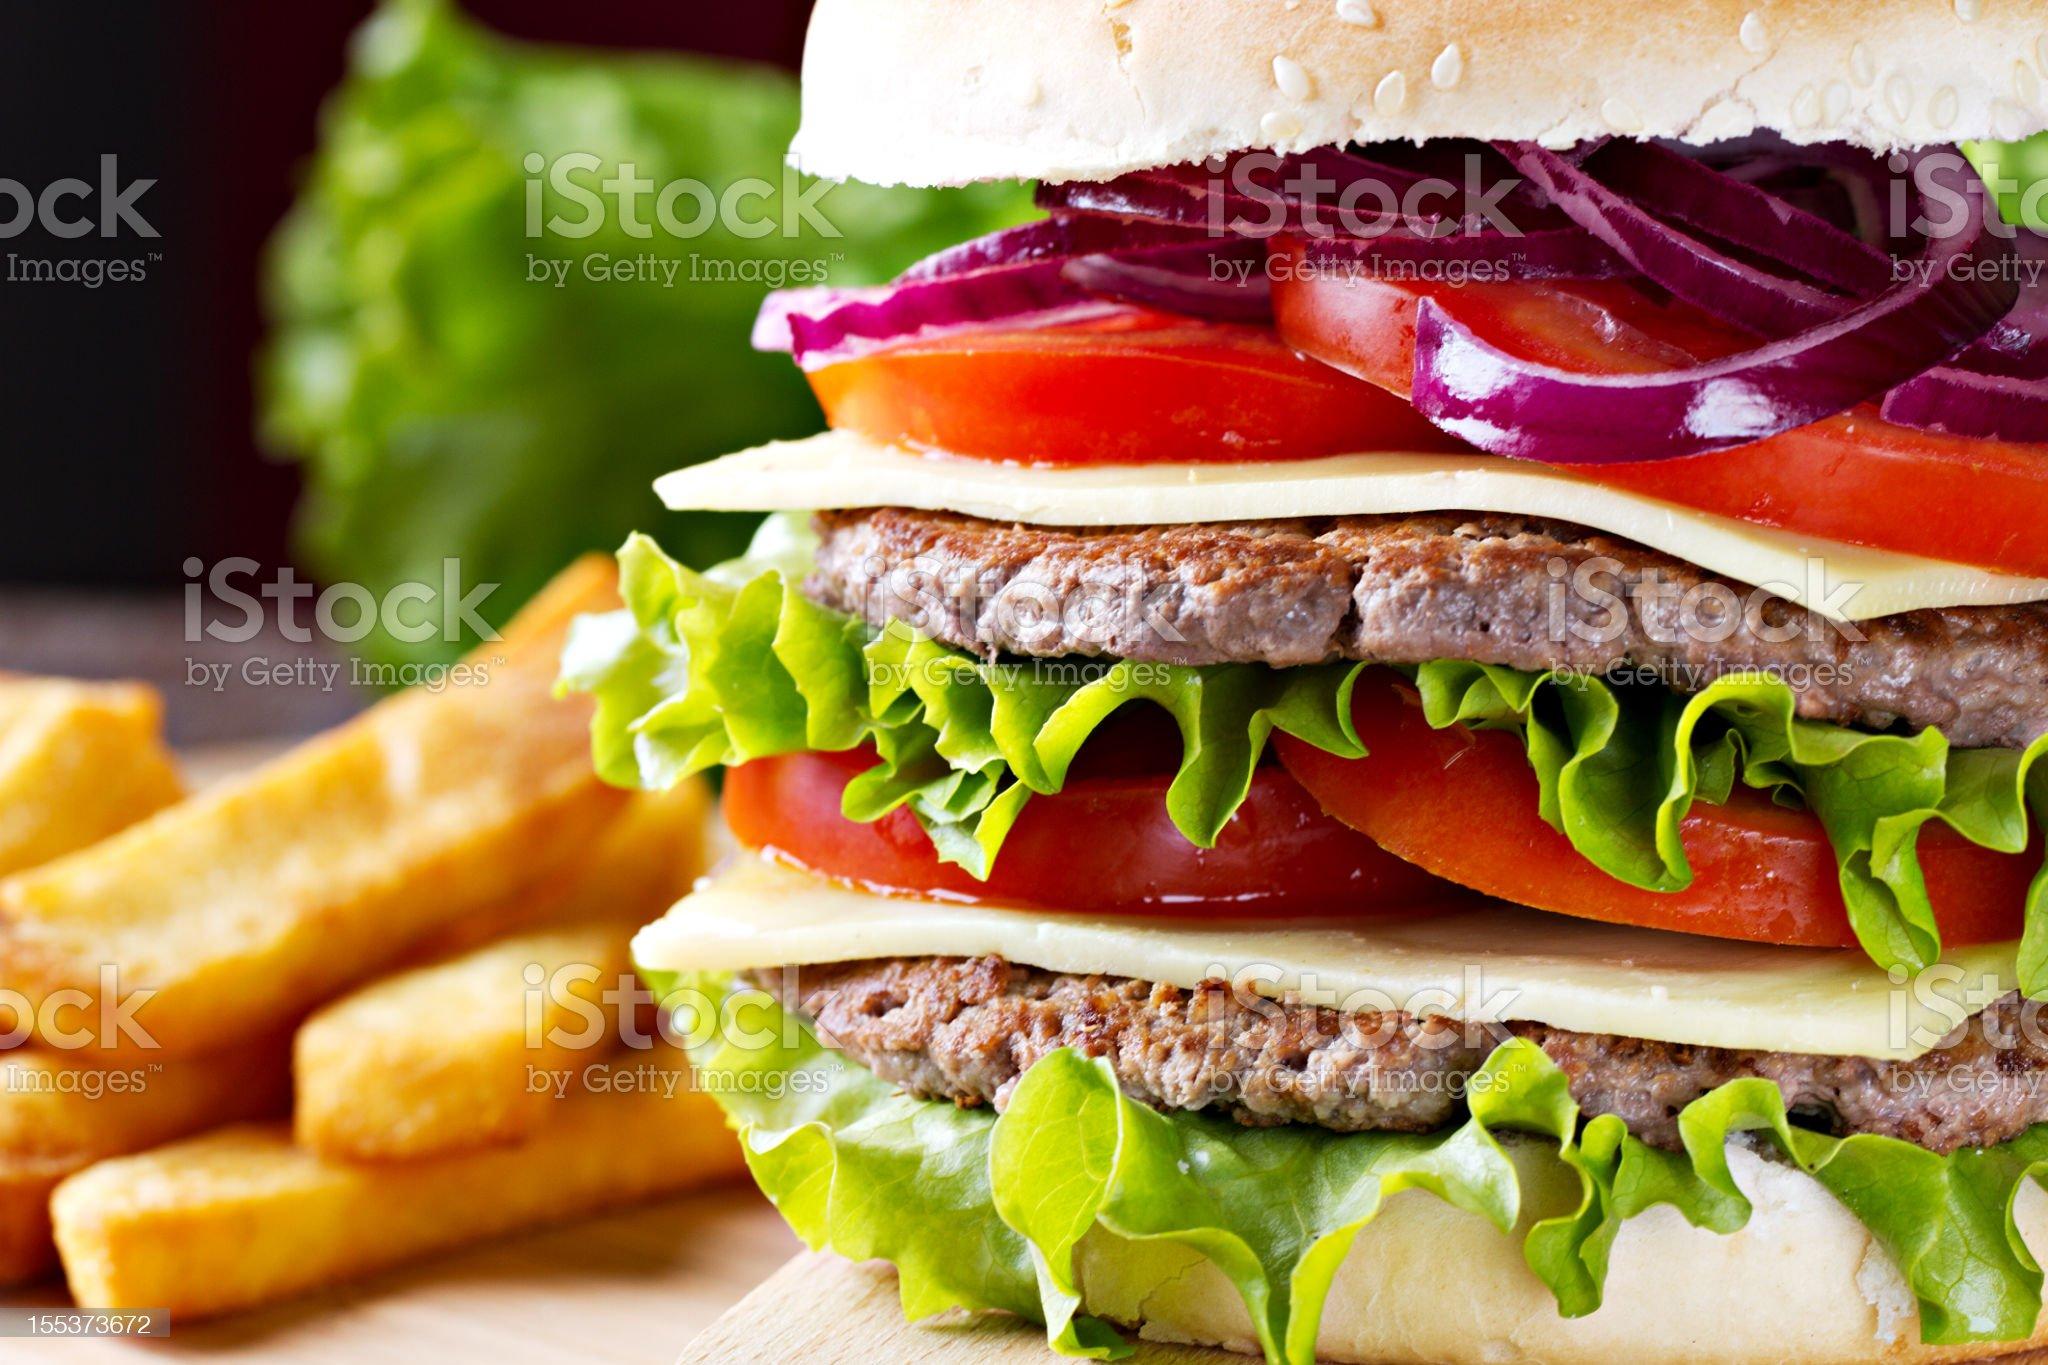 Fresh Hamburger royalty-free stock photo